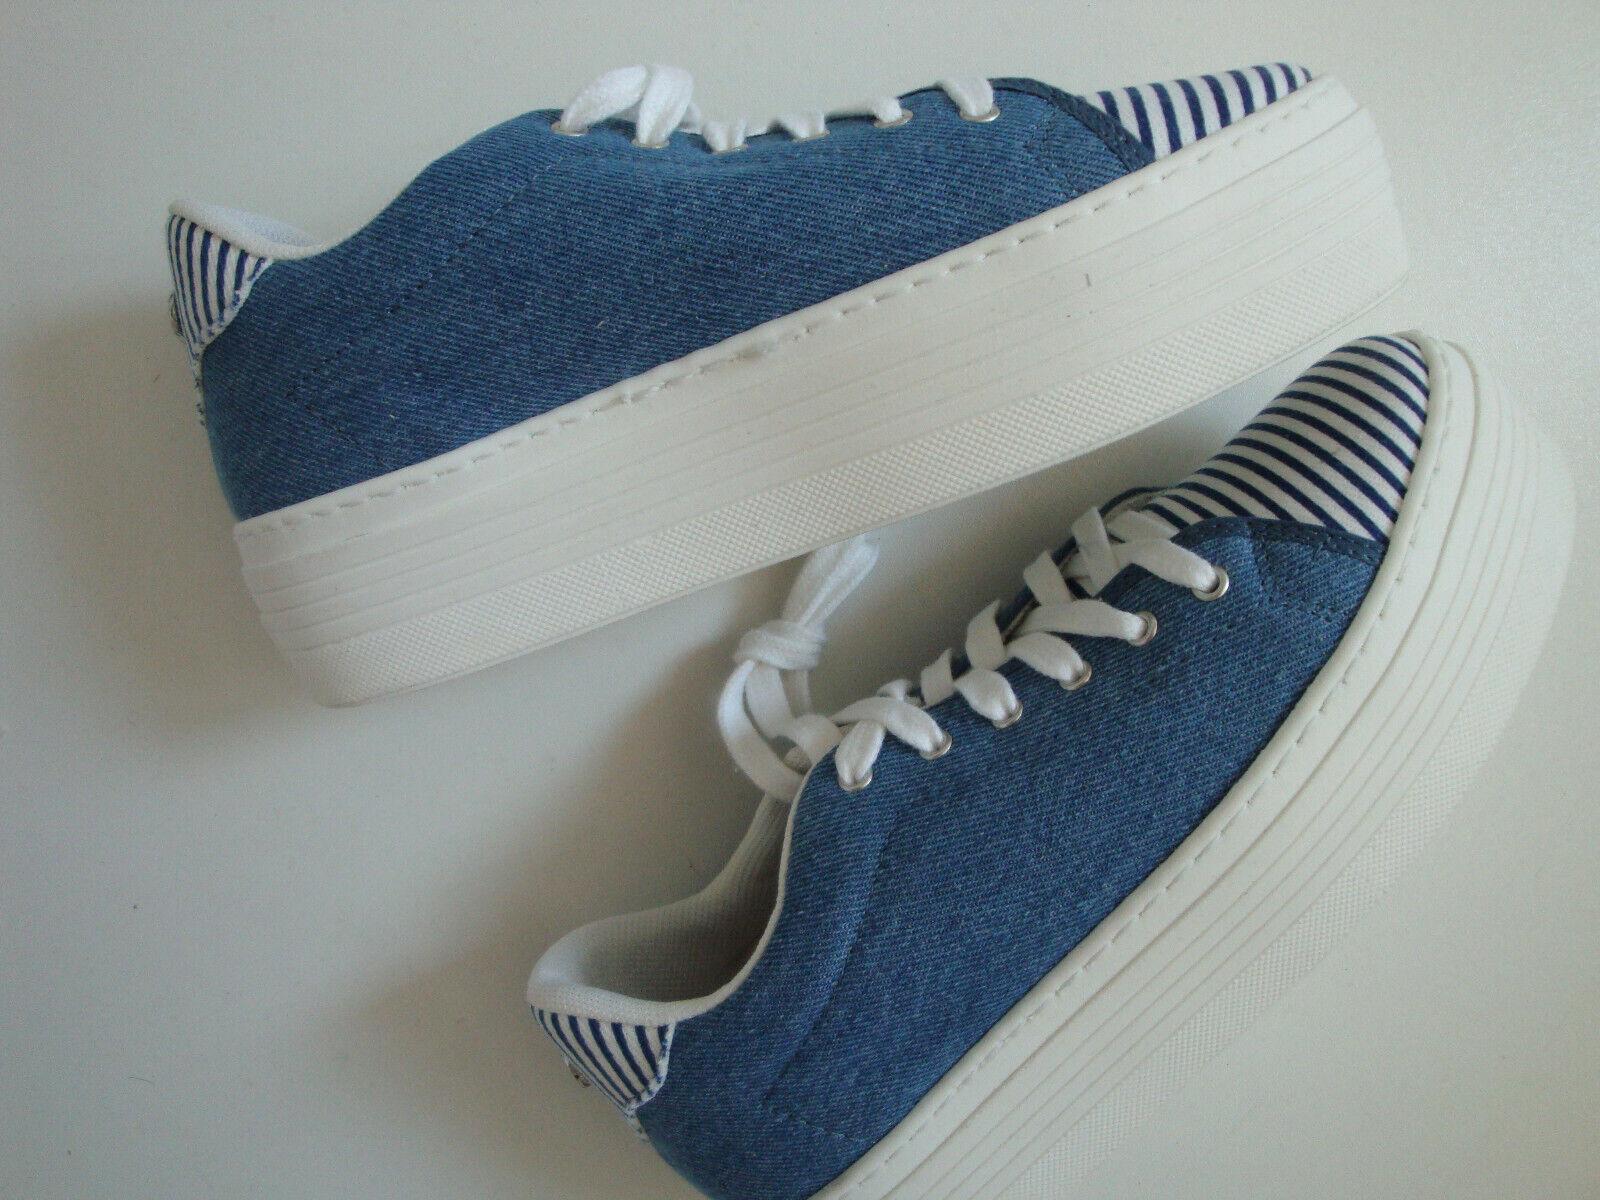 GUESS  Schuhe  Turnschuhe  SUMY  Blau  Jeans  Optik  Plateau  Bauwolle  Gr. 37  Neu